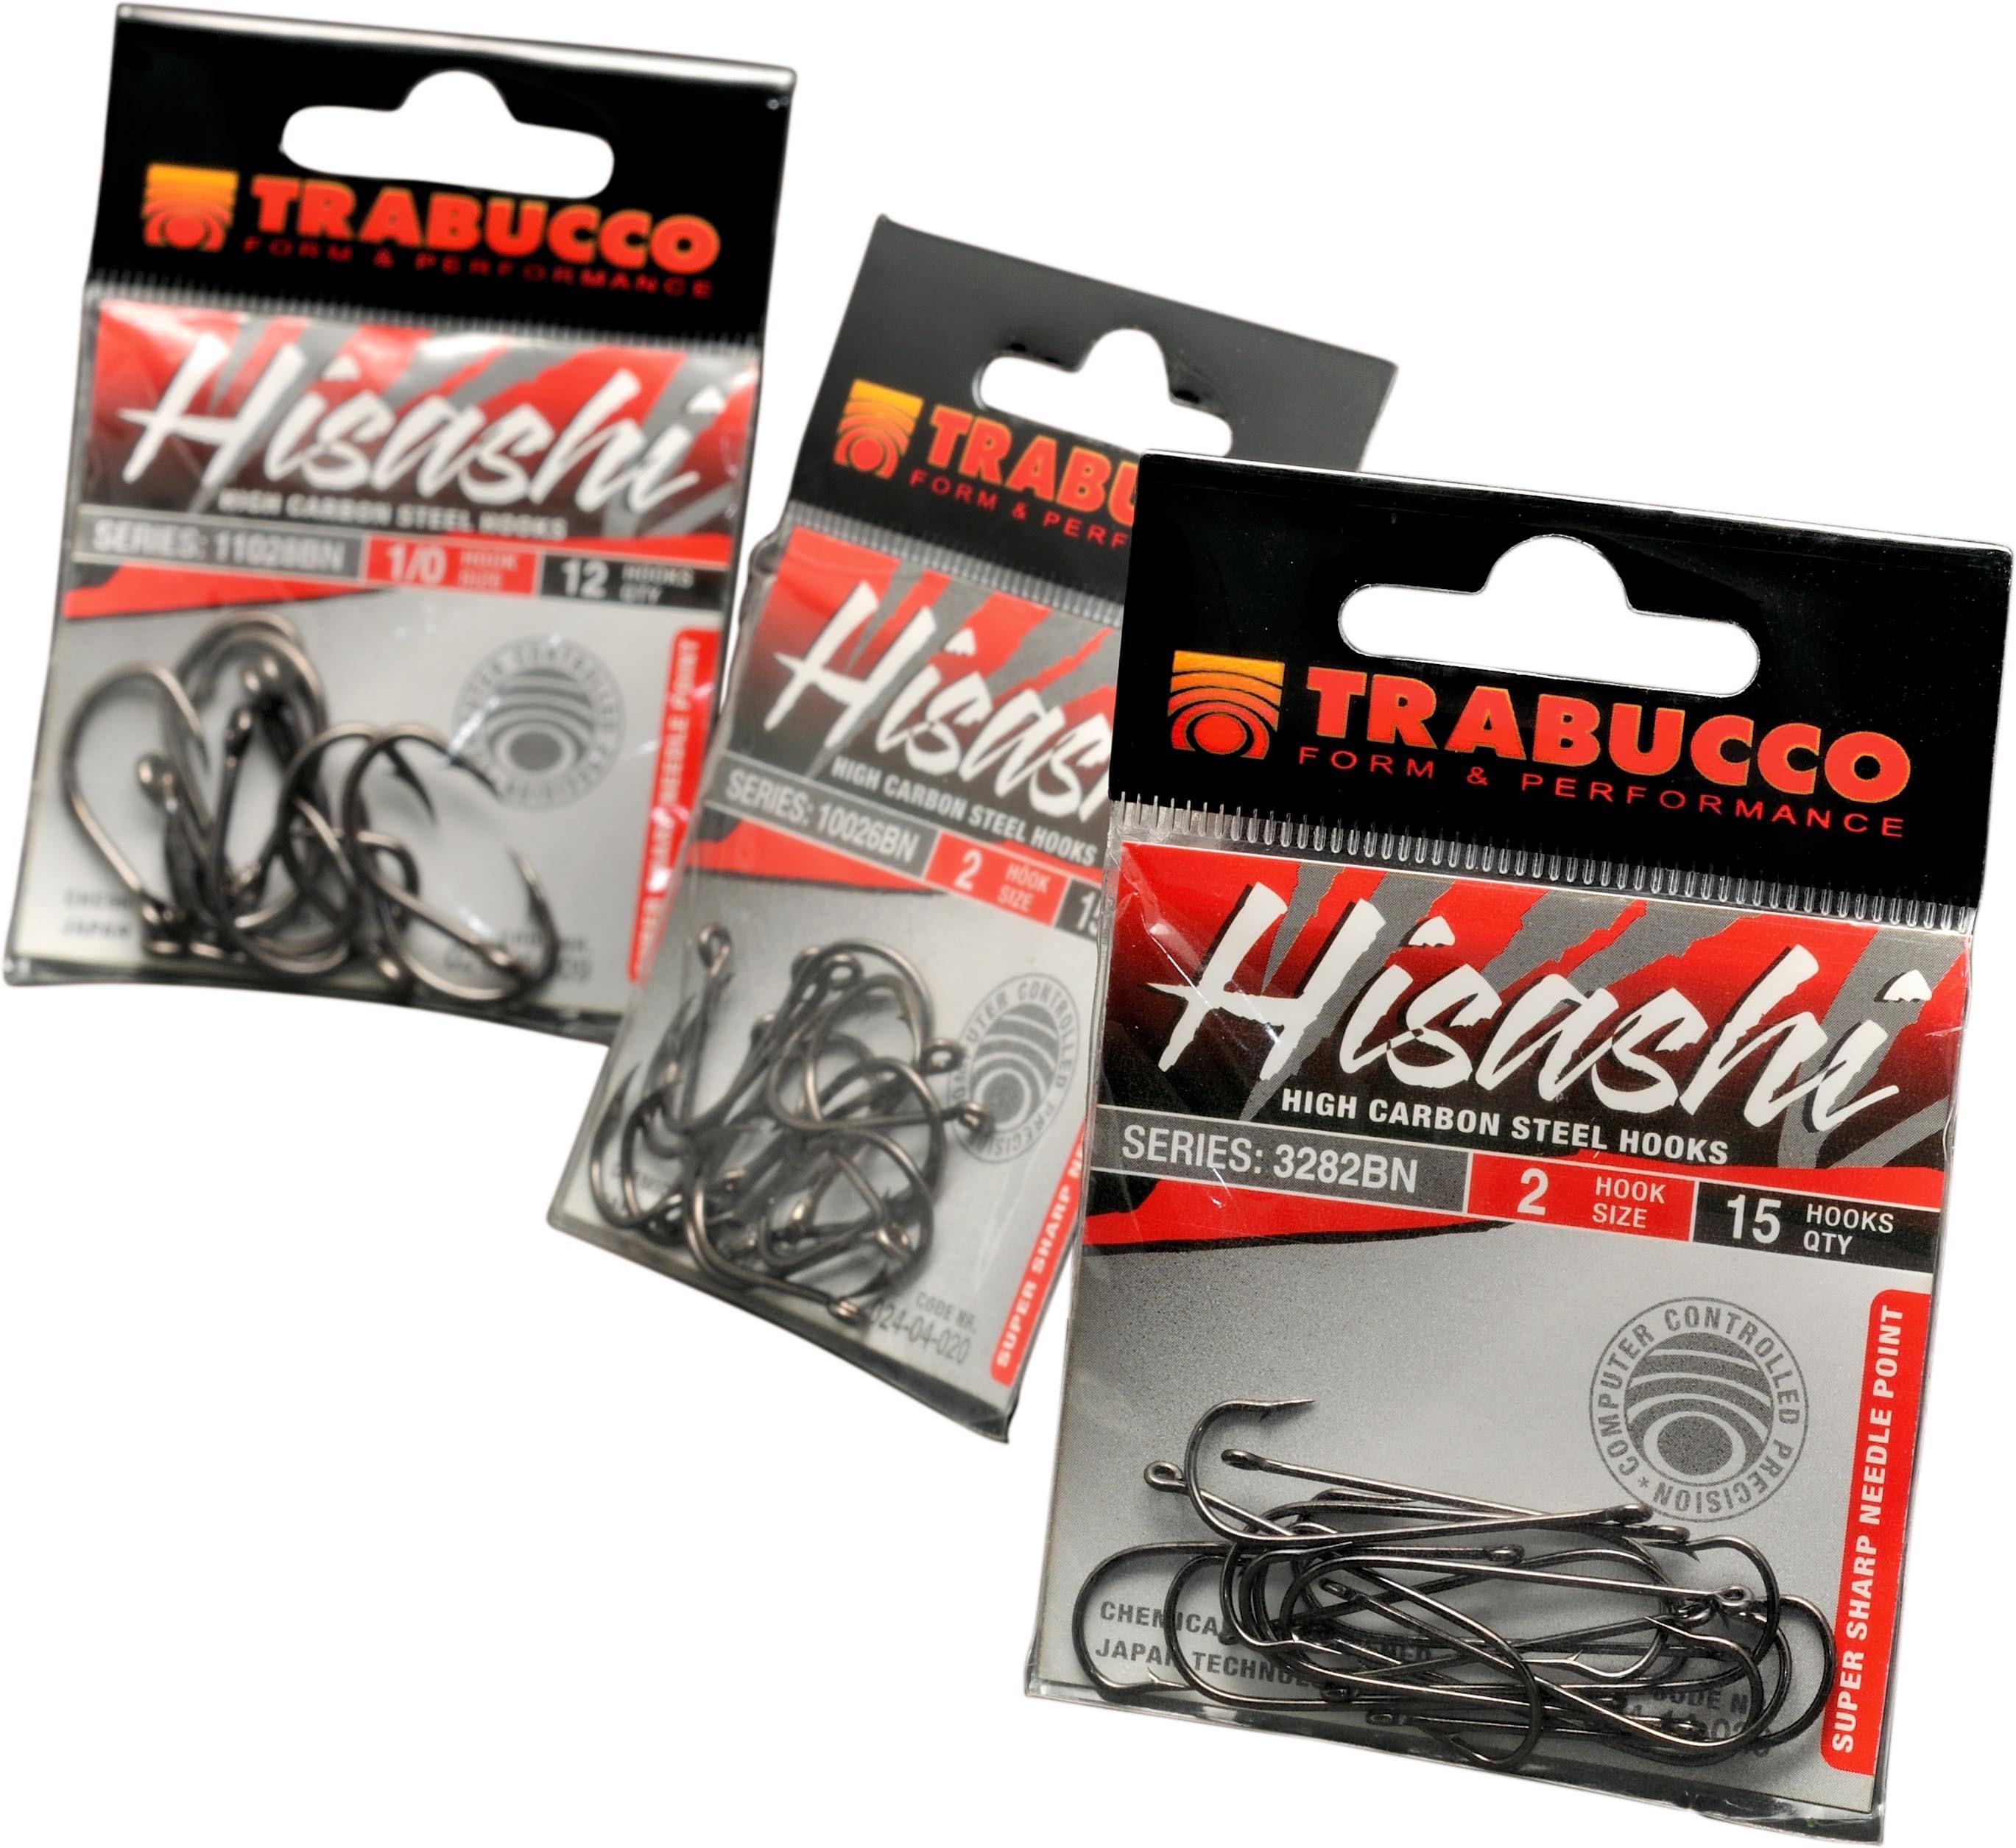 Hirashi Chinu Hooks 10026